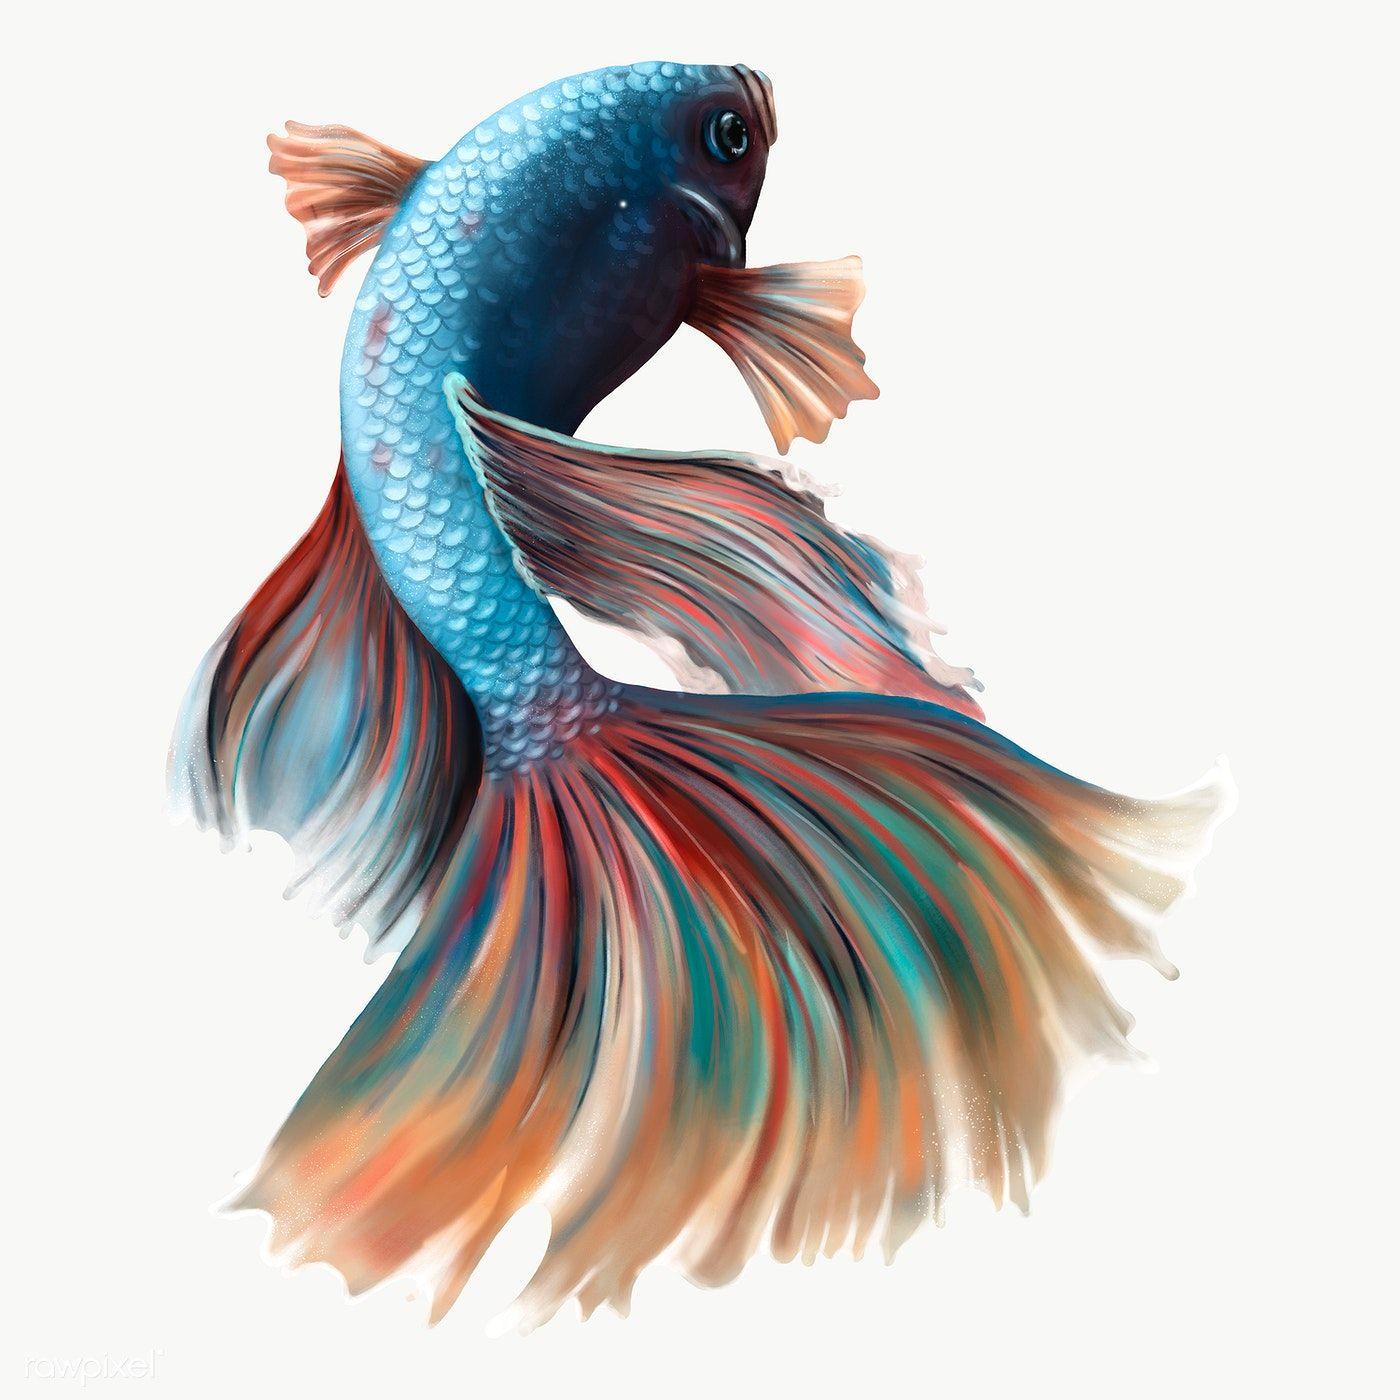 Colorful Betta Fish Design Element Premium Image By Rawpixel Com Te Betta Fish Fish Design Logo Fish Design